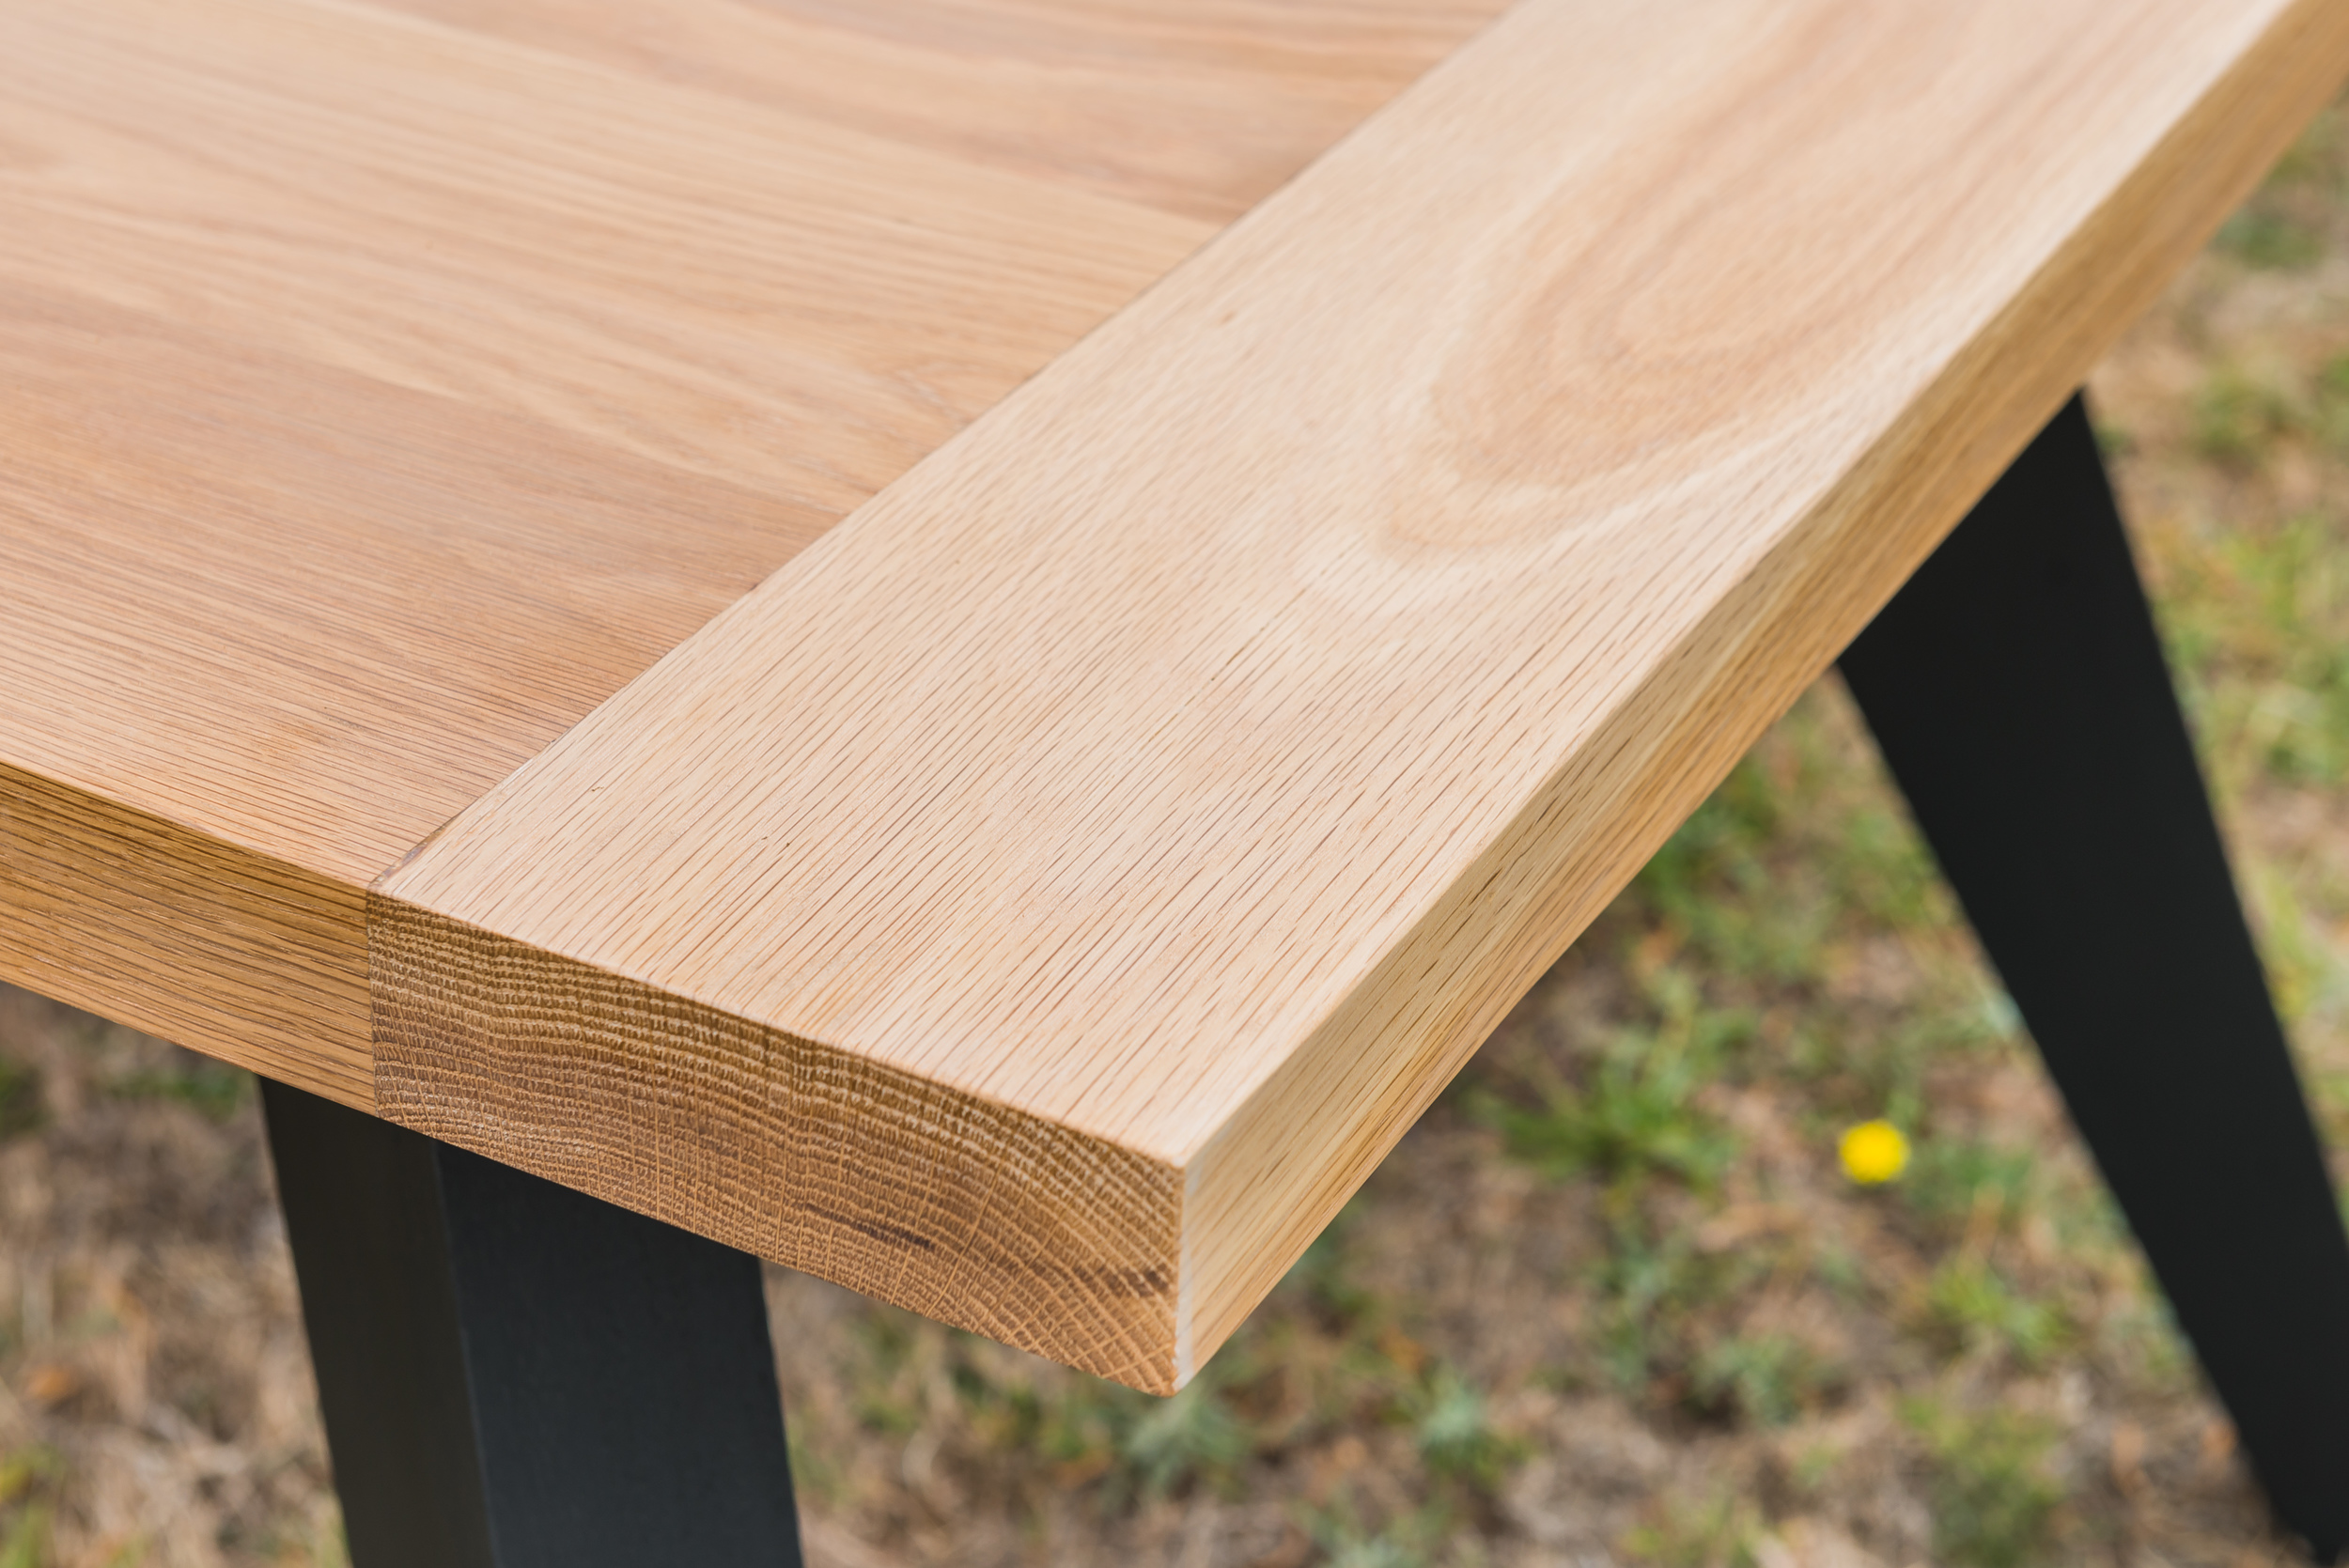 natural looking timber furniture